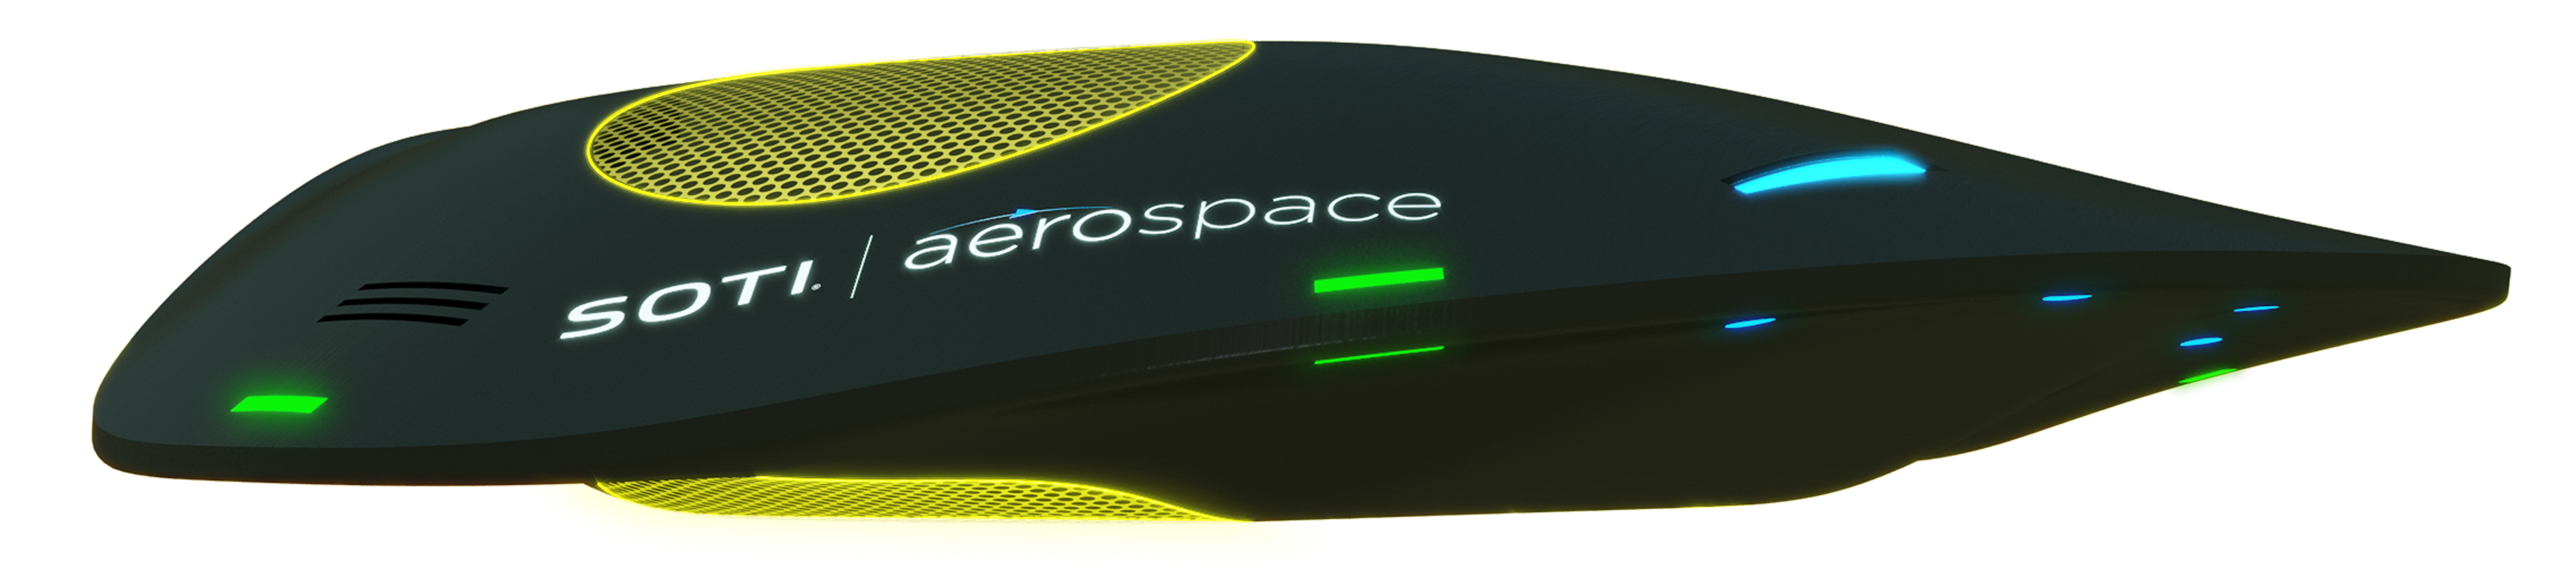 SOTI Aerospace Drone